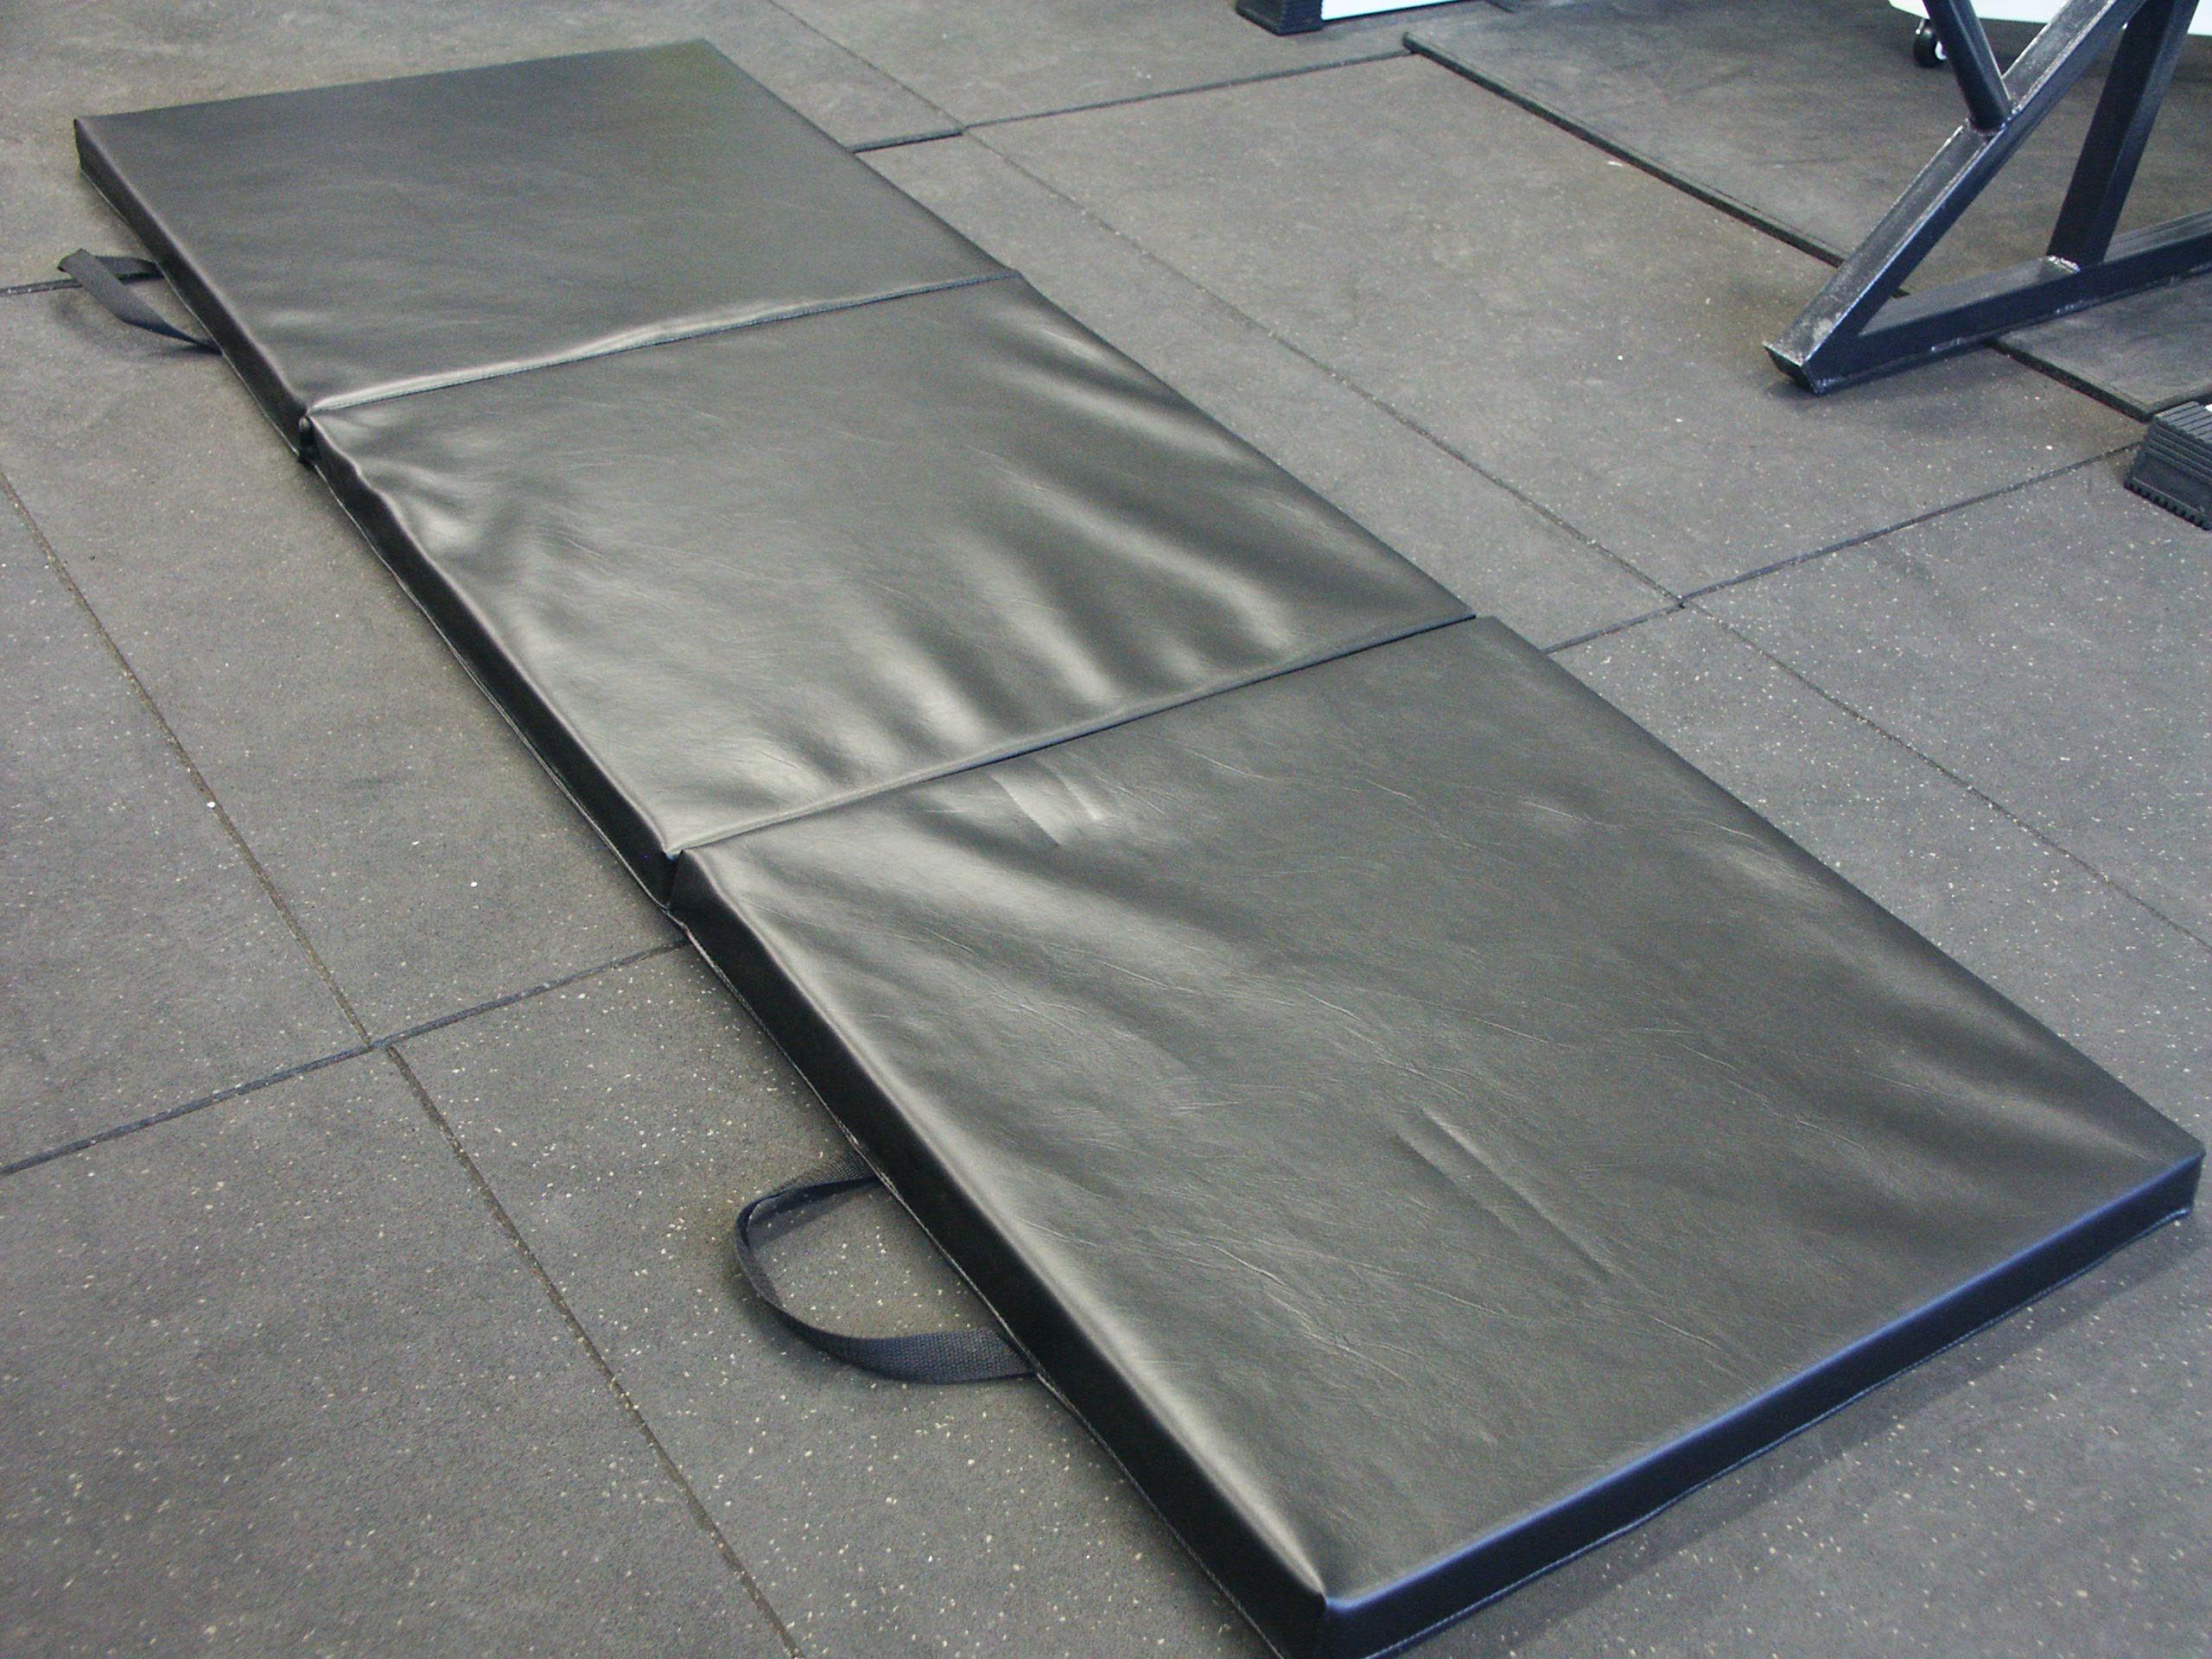 Unfolded Exercise mat